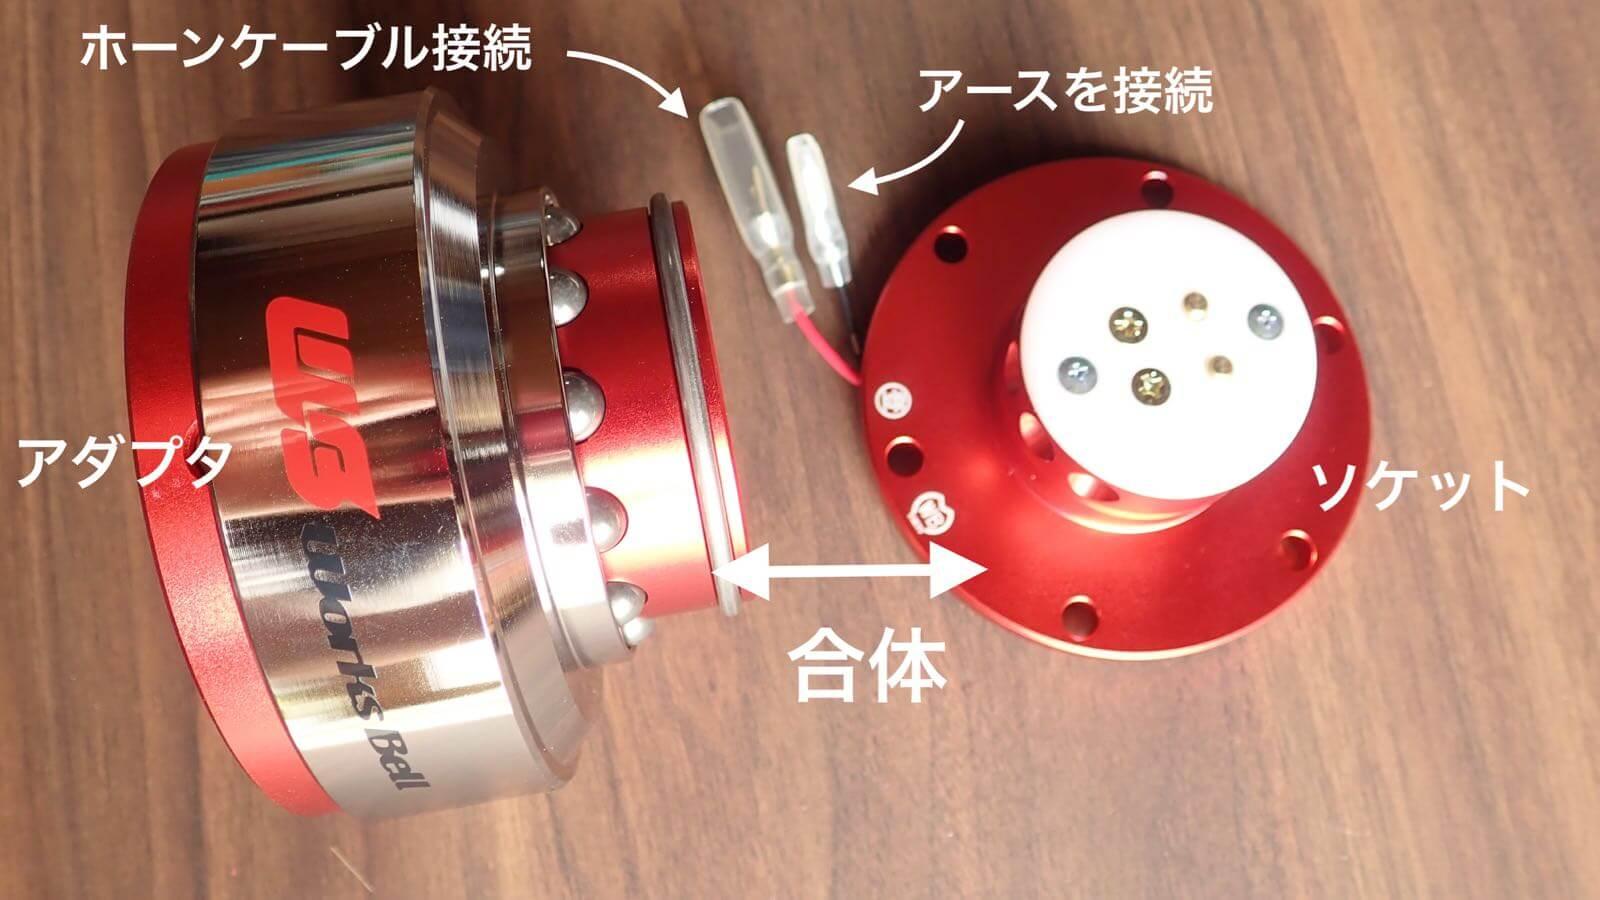 0207 MR2 Works Bell Rapfix2 installation method 09